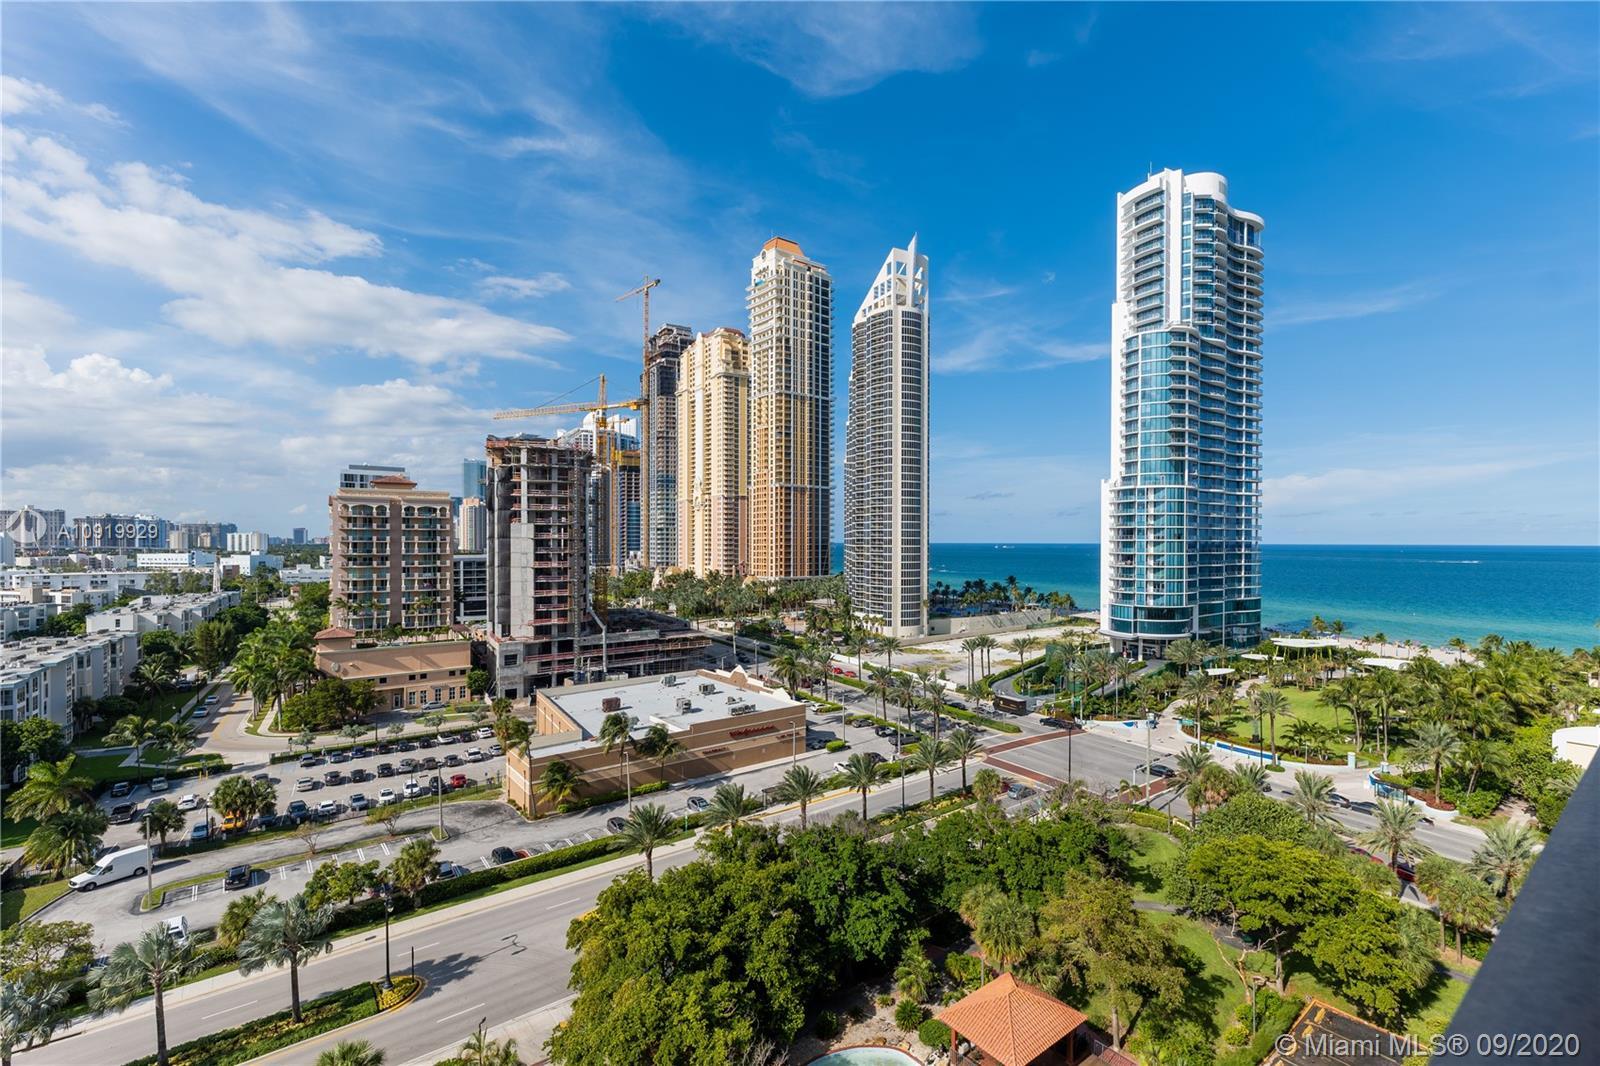 Winston Tower 600 #1517 - 210 174th St #1517, Sunny Isles Beach, FL 33160